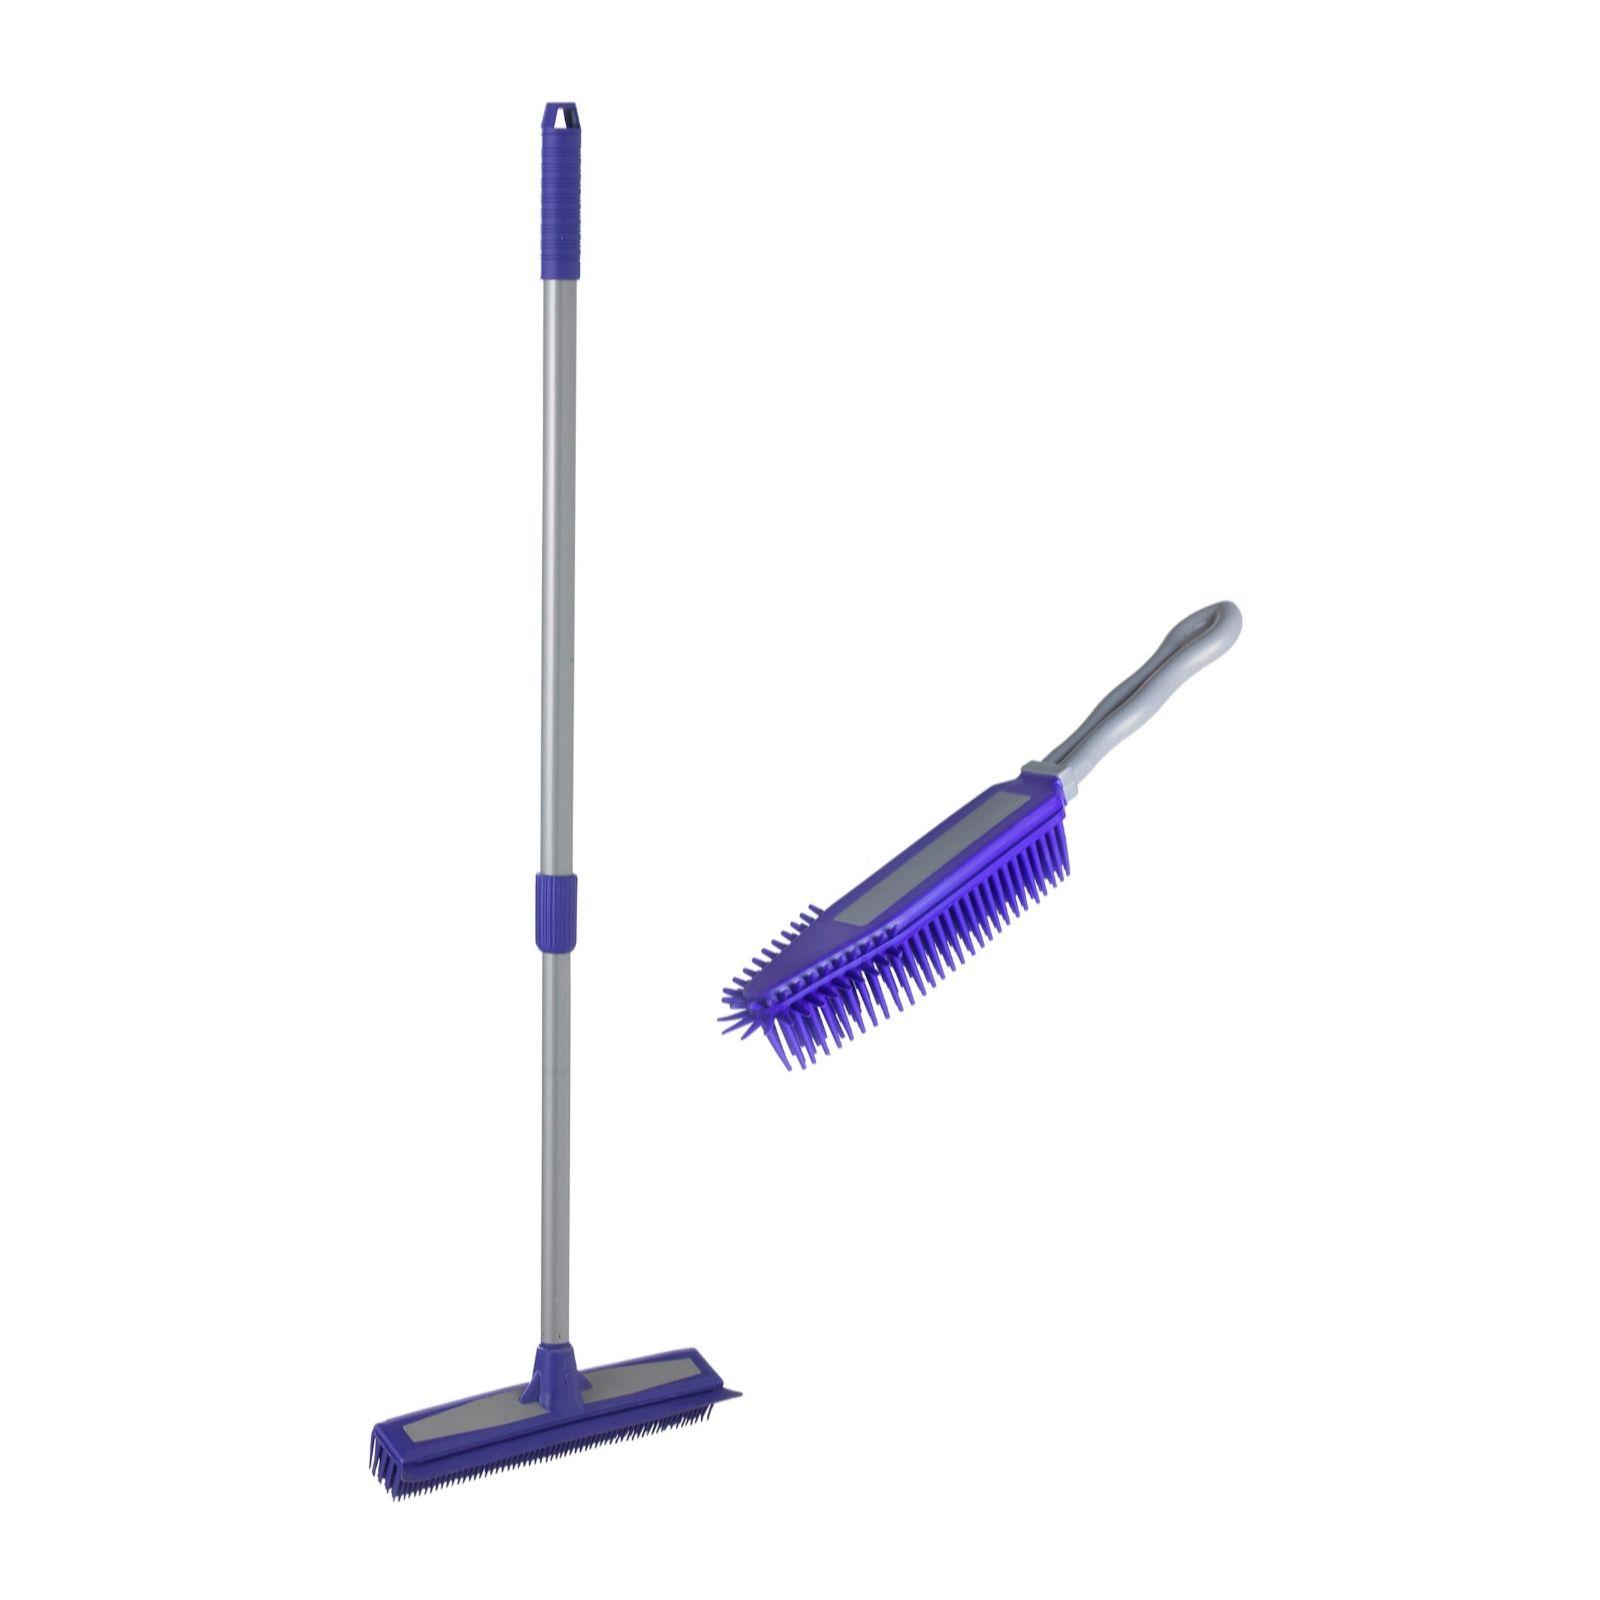 Lakeland Rubber Buddy Brush Amp Broom Set Qvc Uk